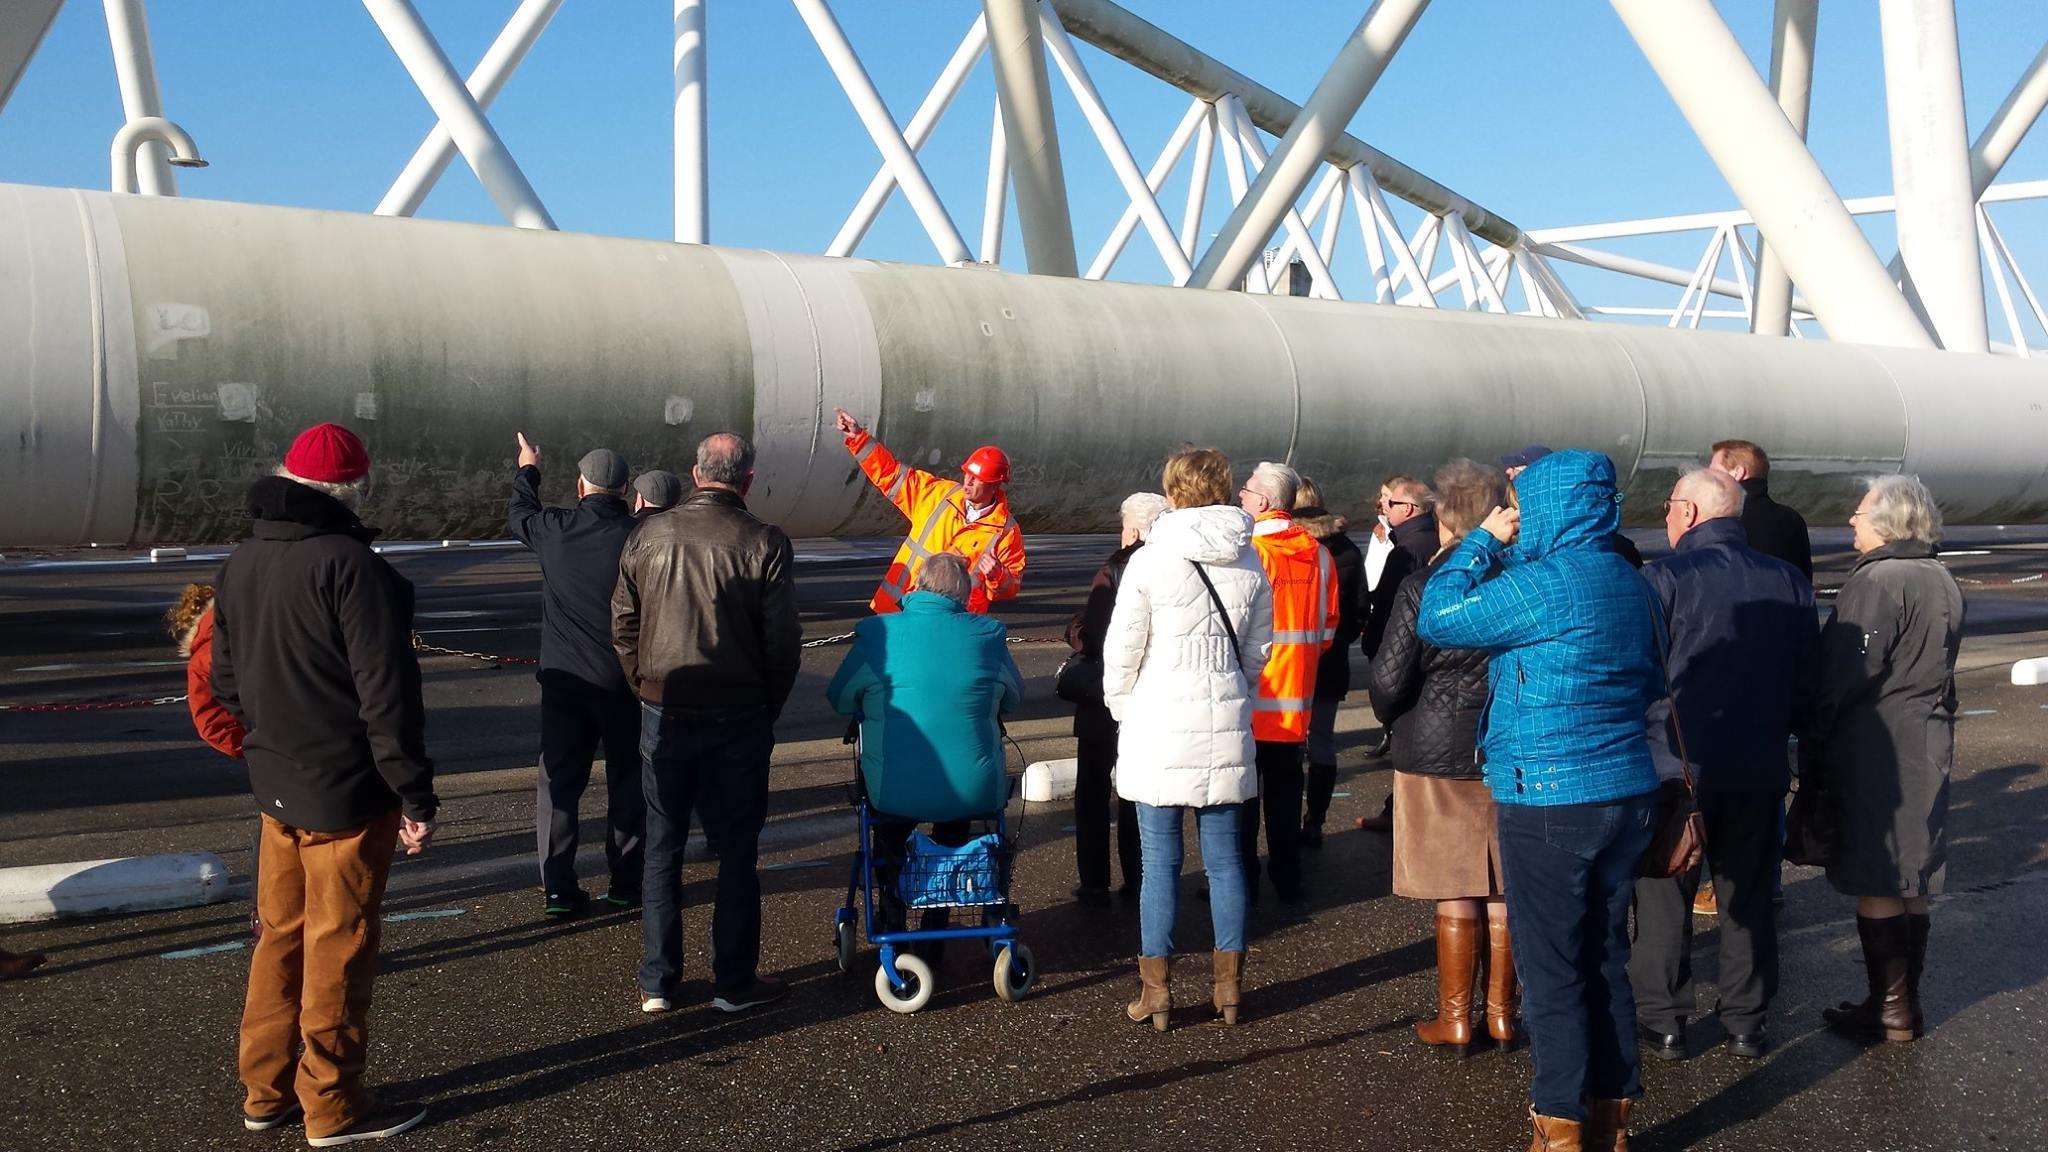 Maeslantkering keringhuis guided tours Rotterdam Holland Delta Works